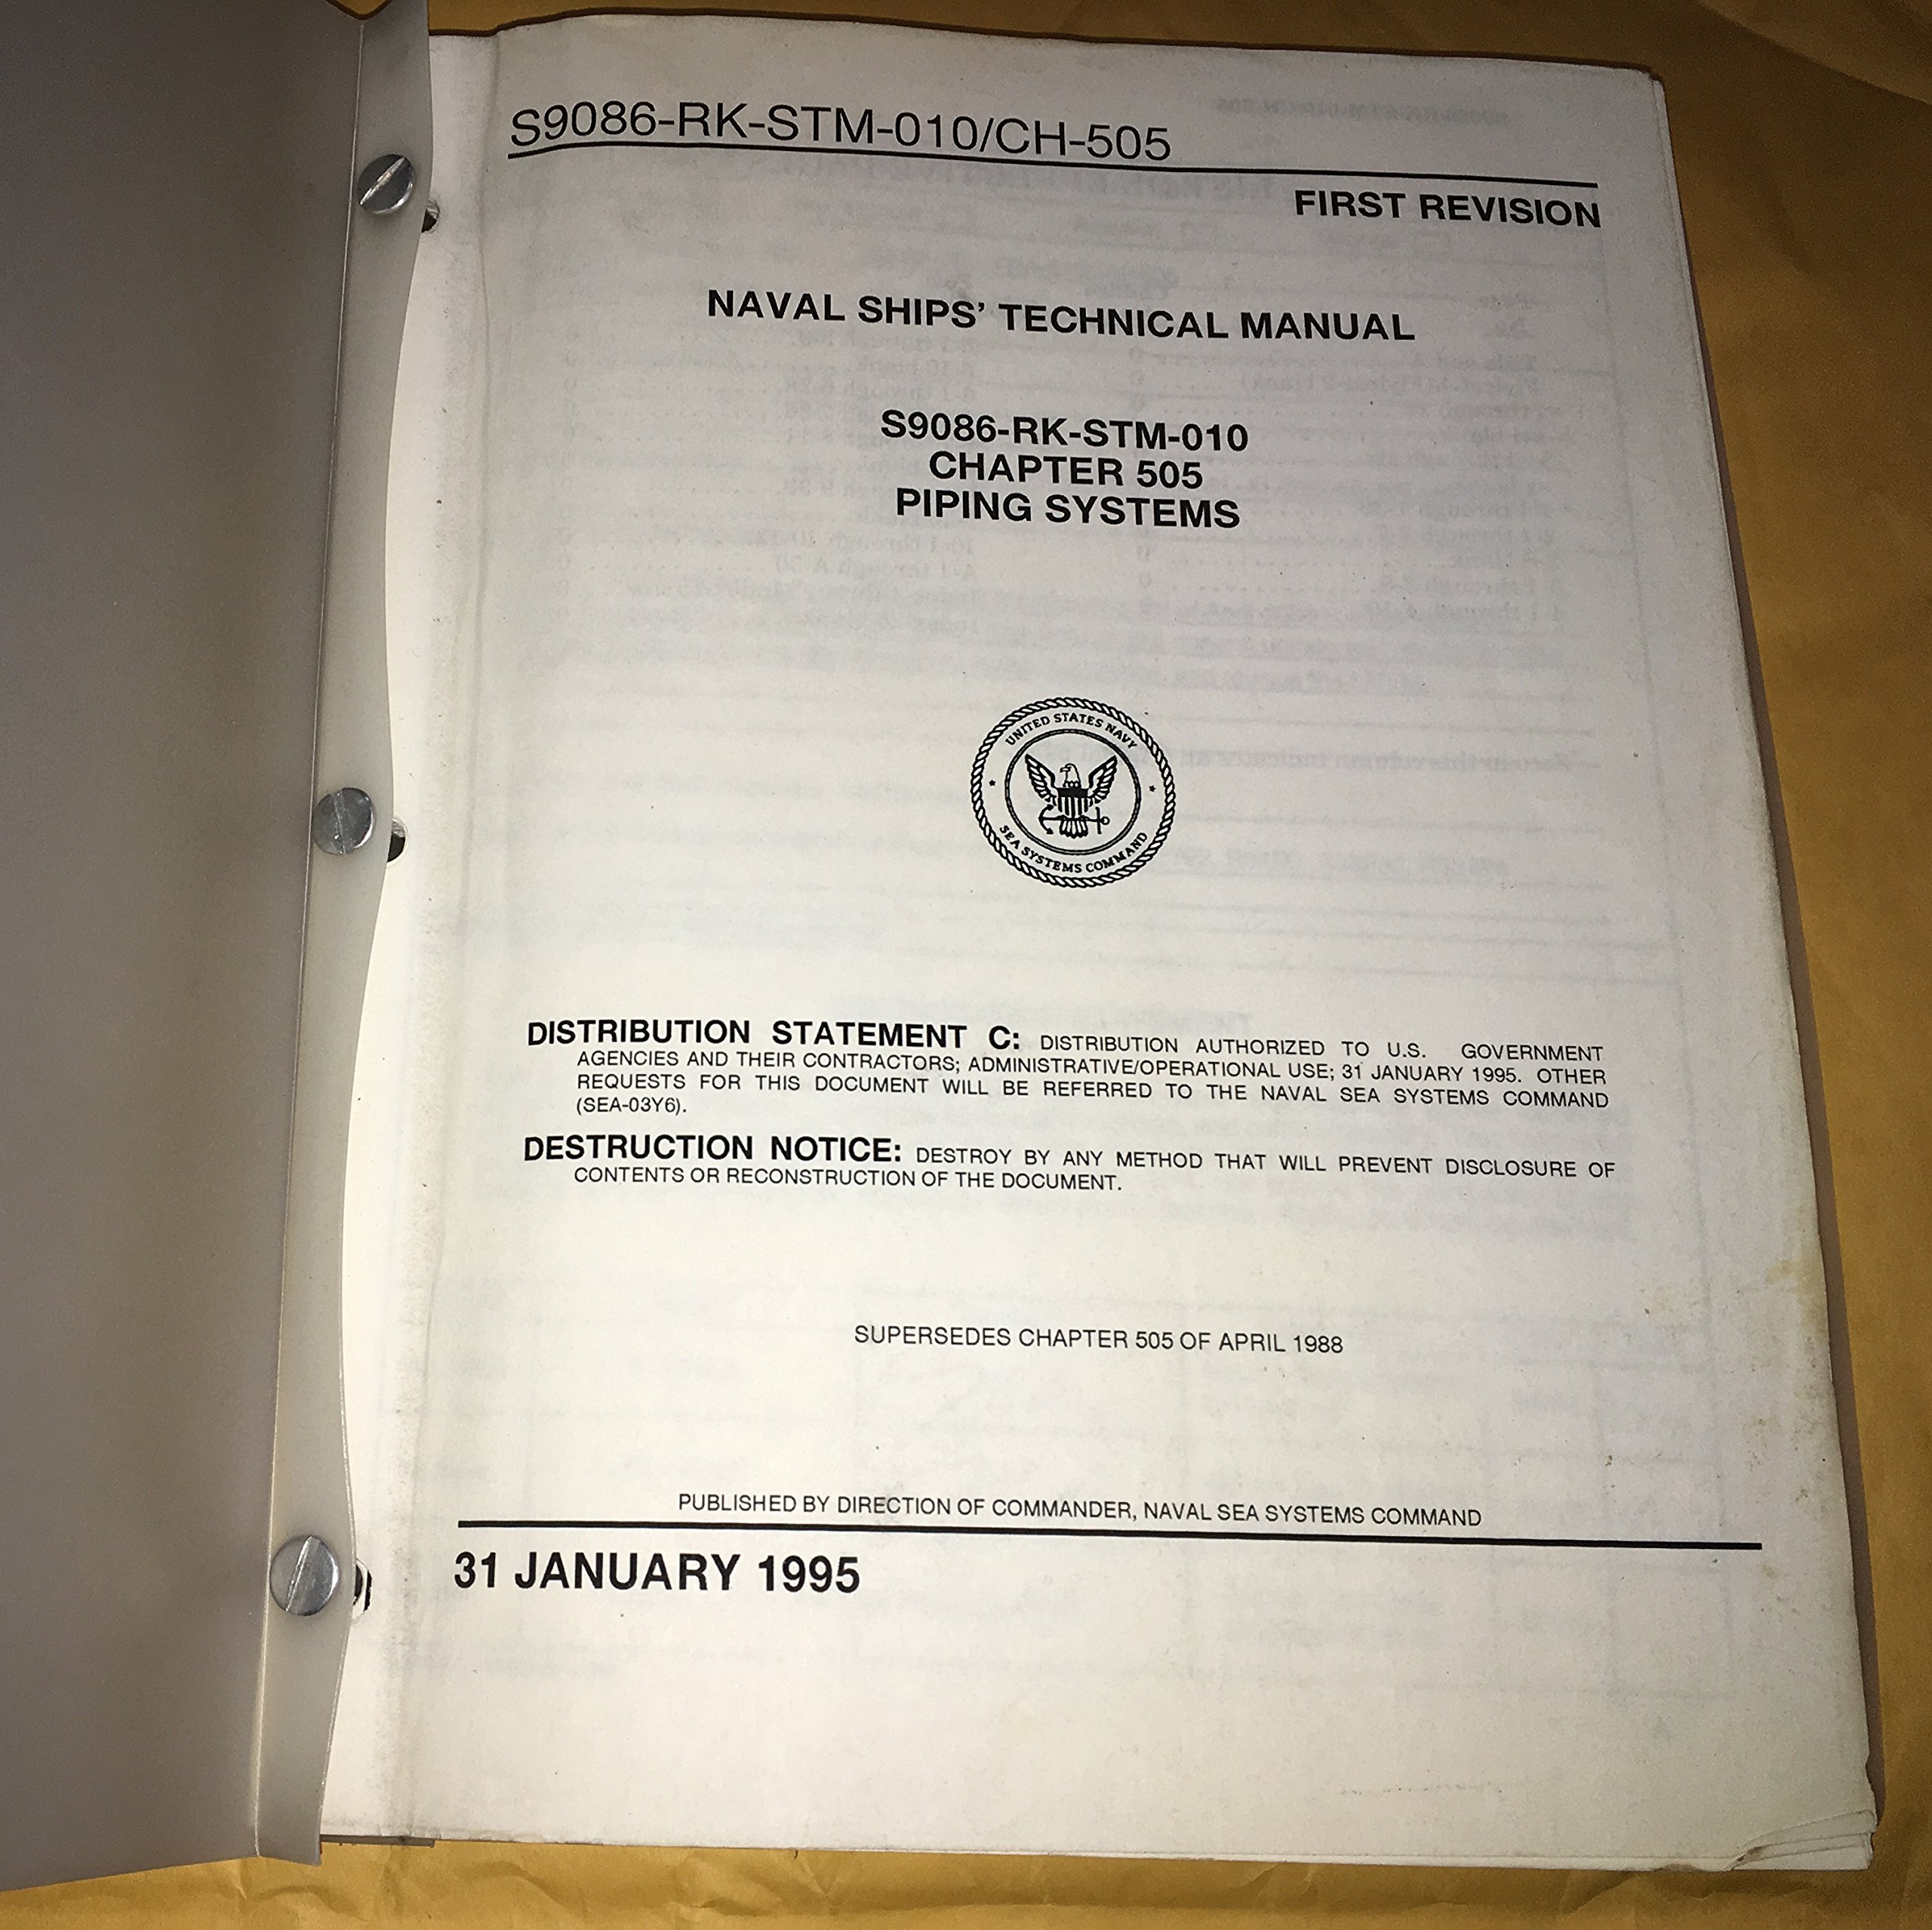 naval technical manual free owners manual u2022 rh wordworksbysea com navy technical manuals navy technical manuals website